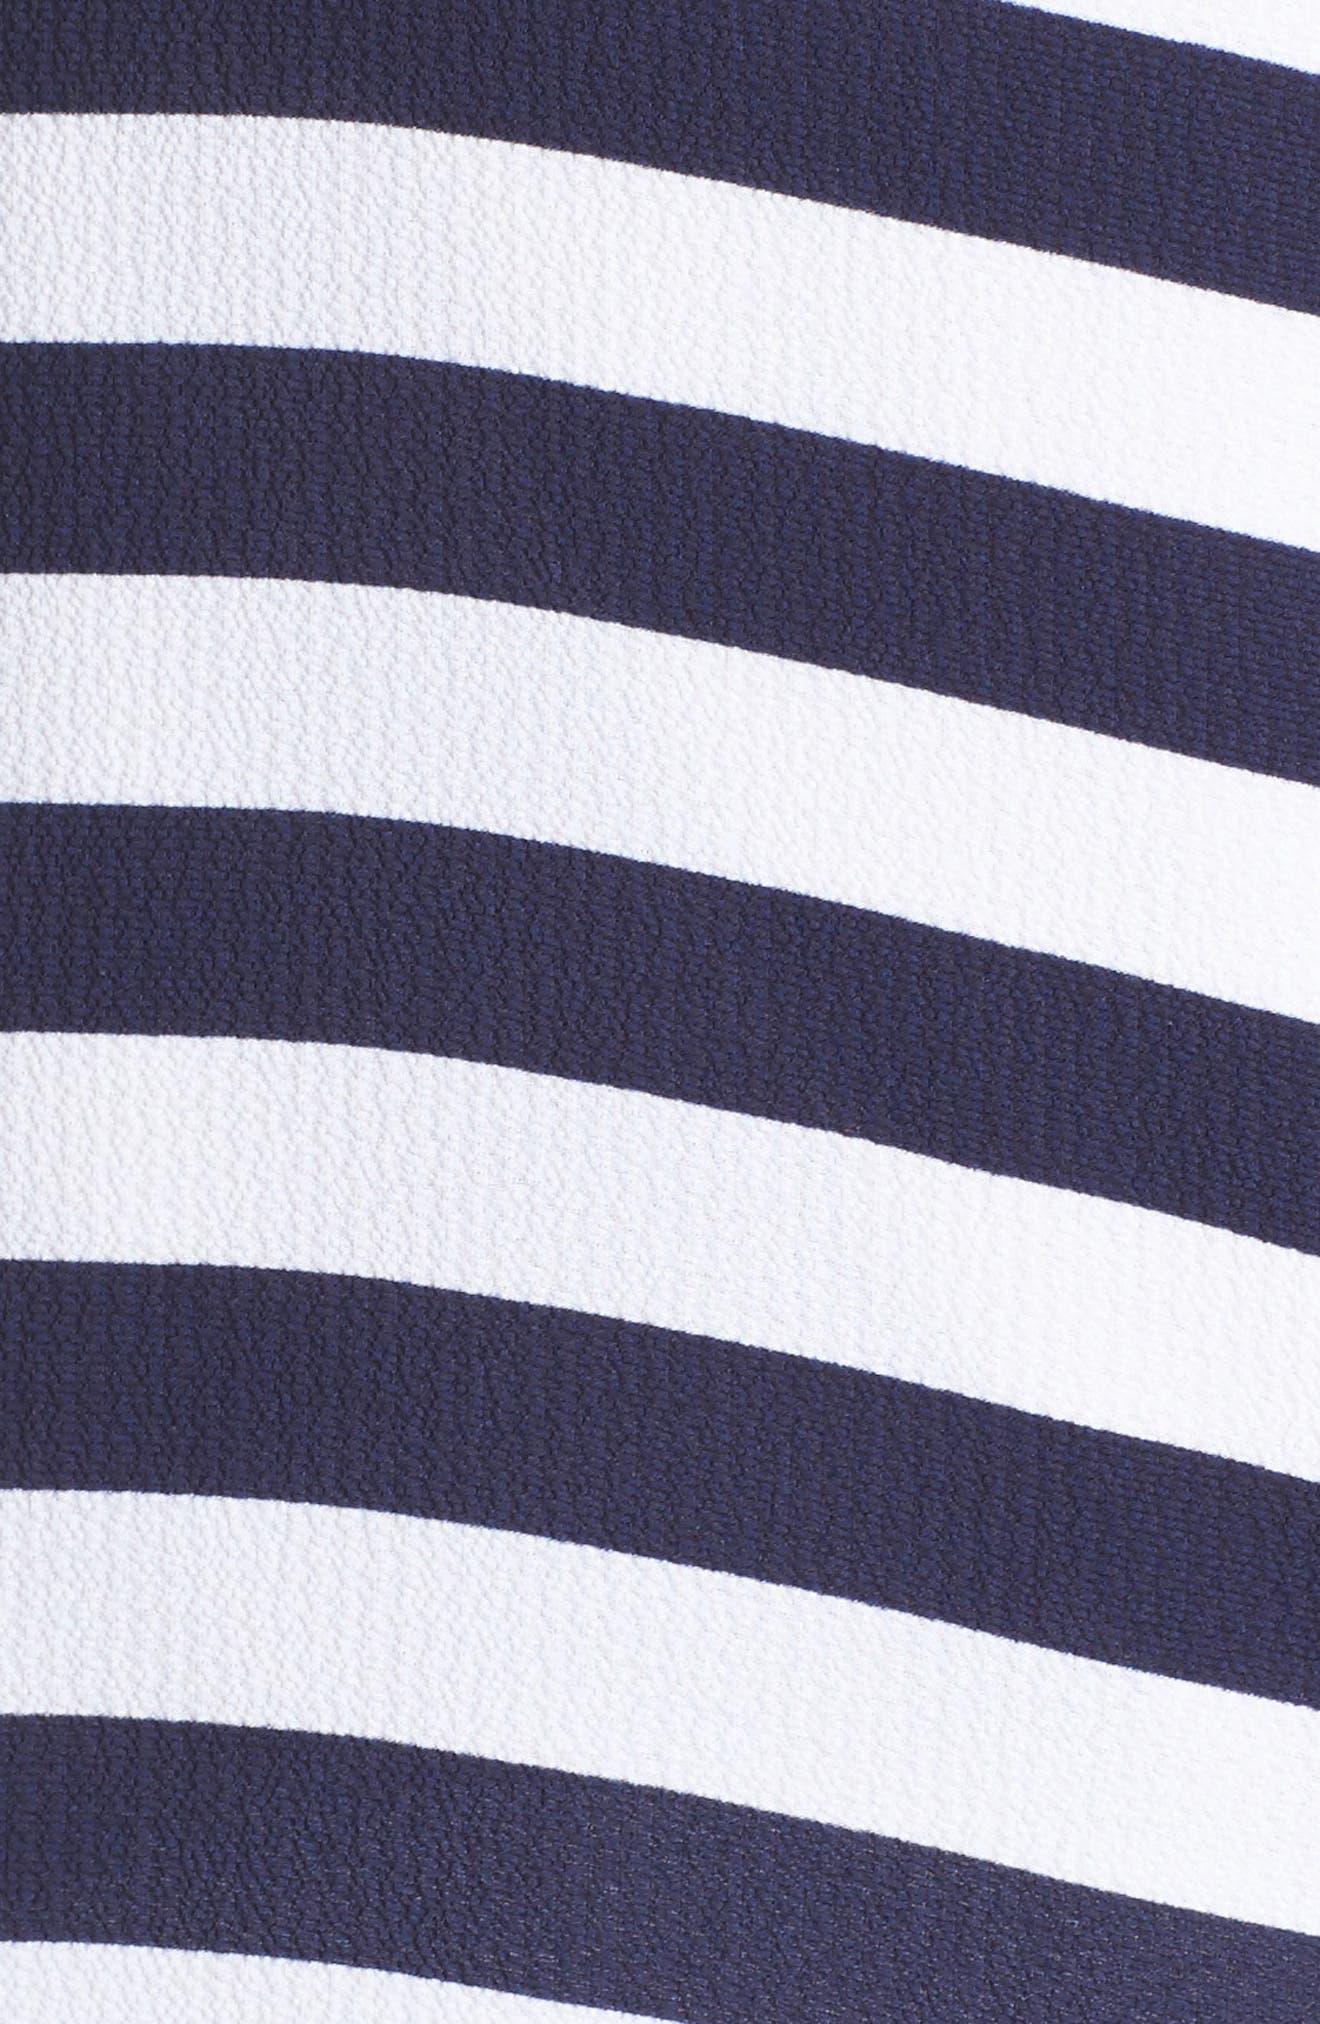 Stripe Side Tie Top,                             Alternate thumbnail 5, color,                             456